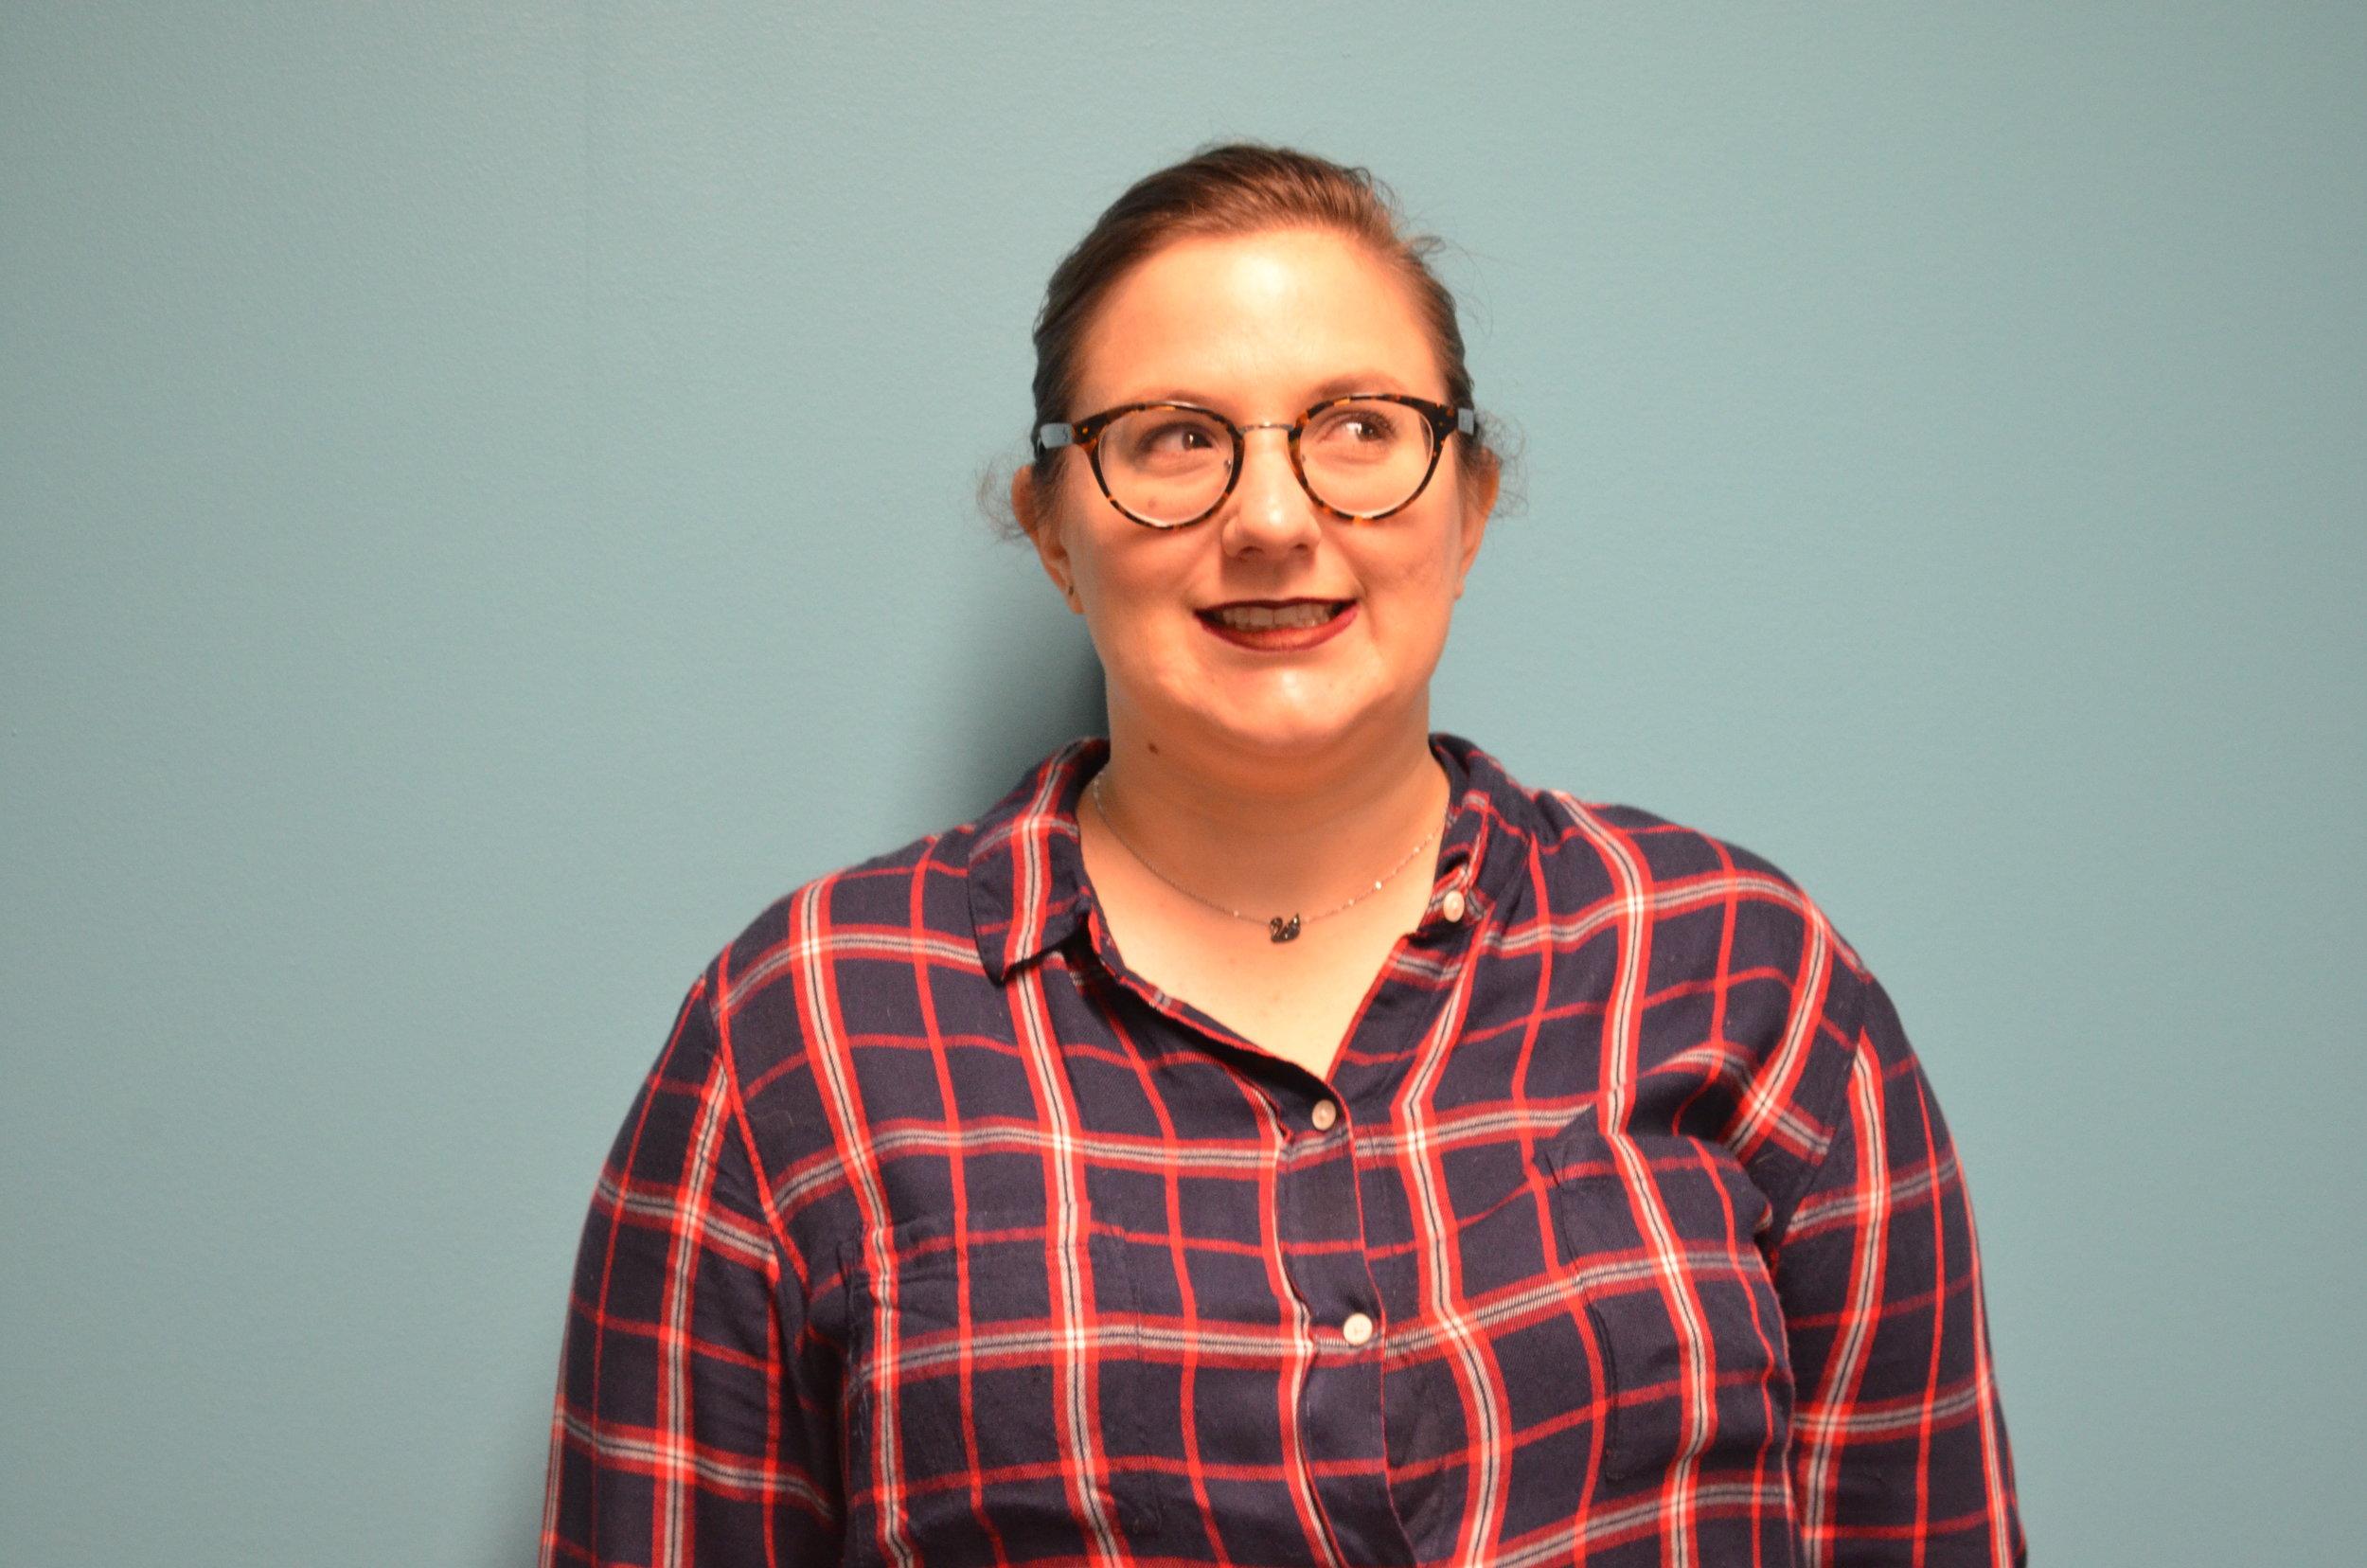 Dr. Melinda Lewis